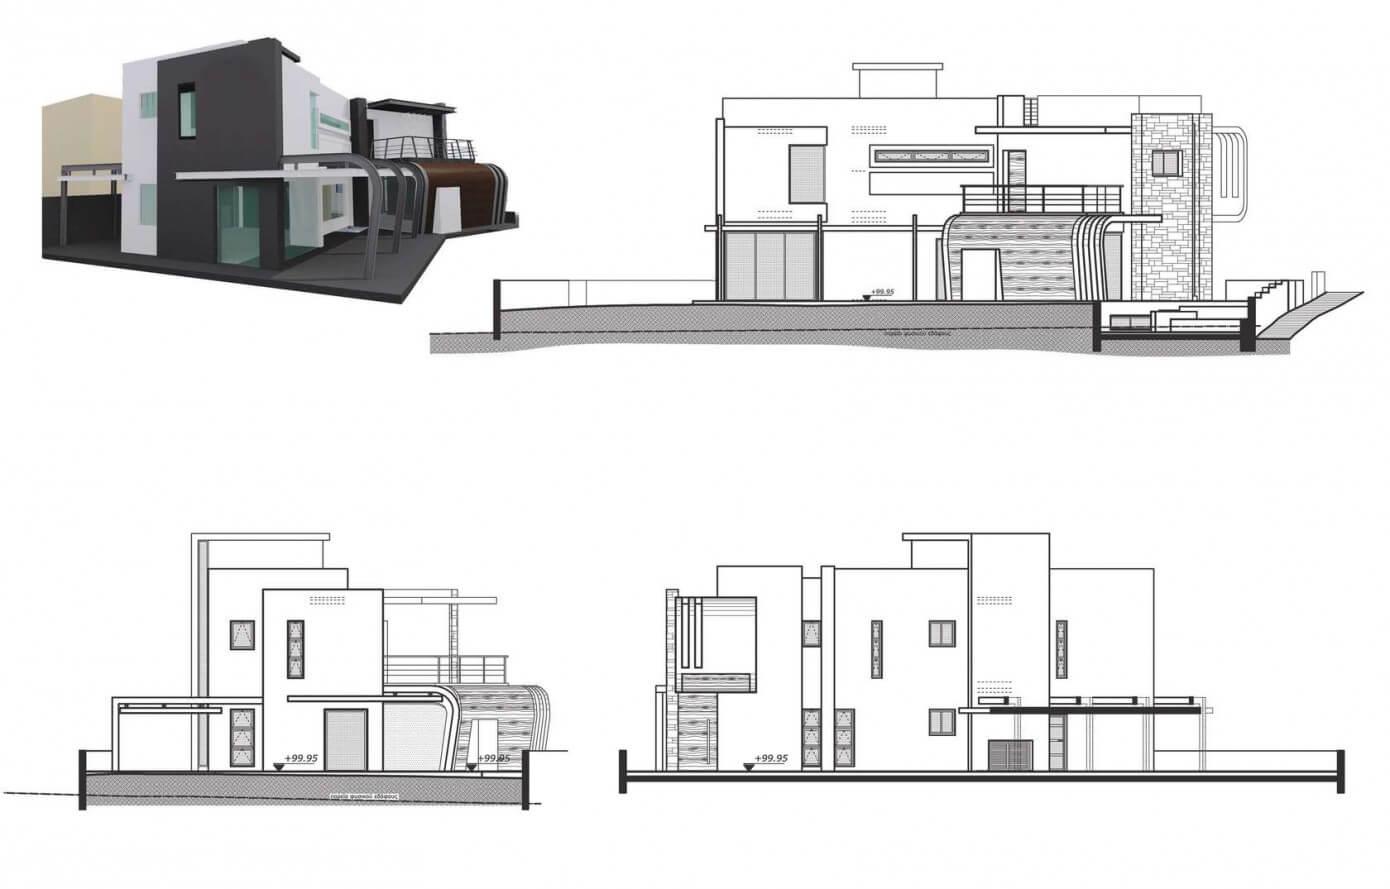 Modelo 3d y alzados de casa moderna de dos plantas for Plantas de viviendas modernas